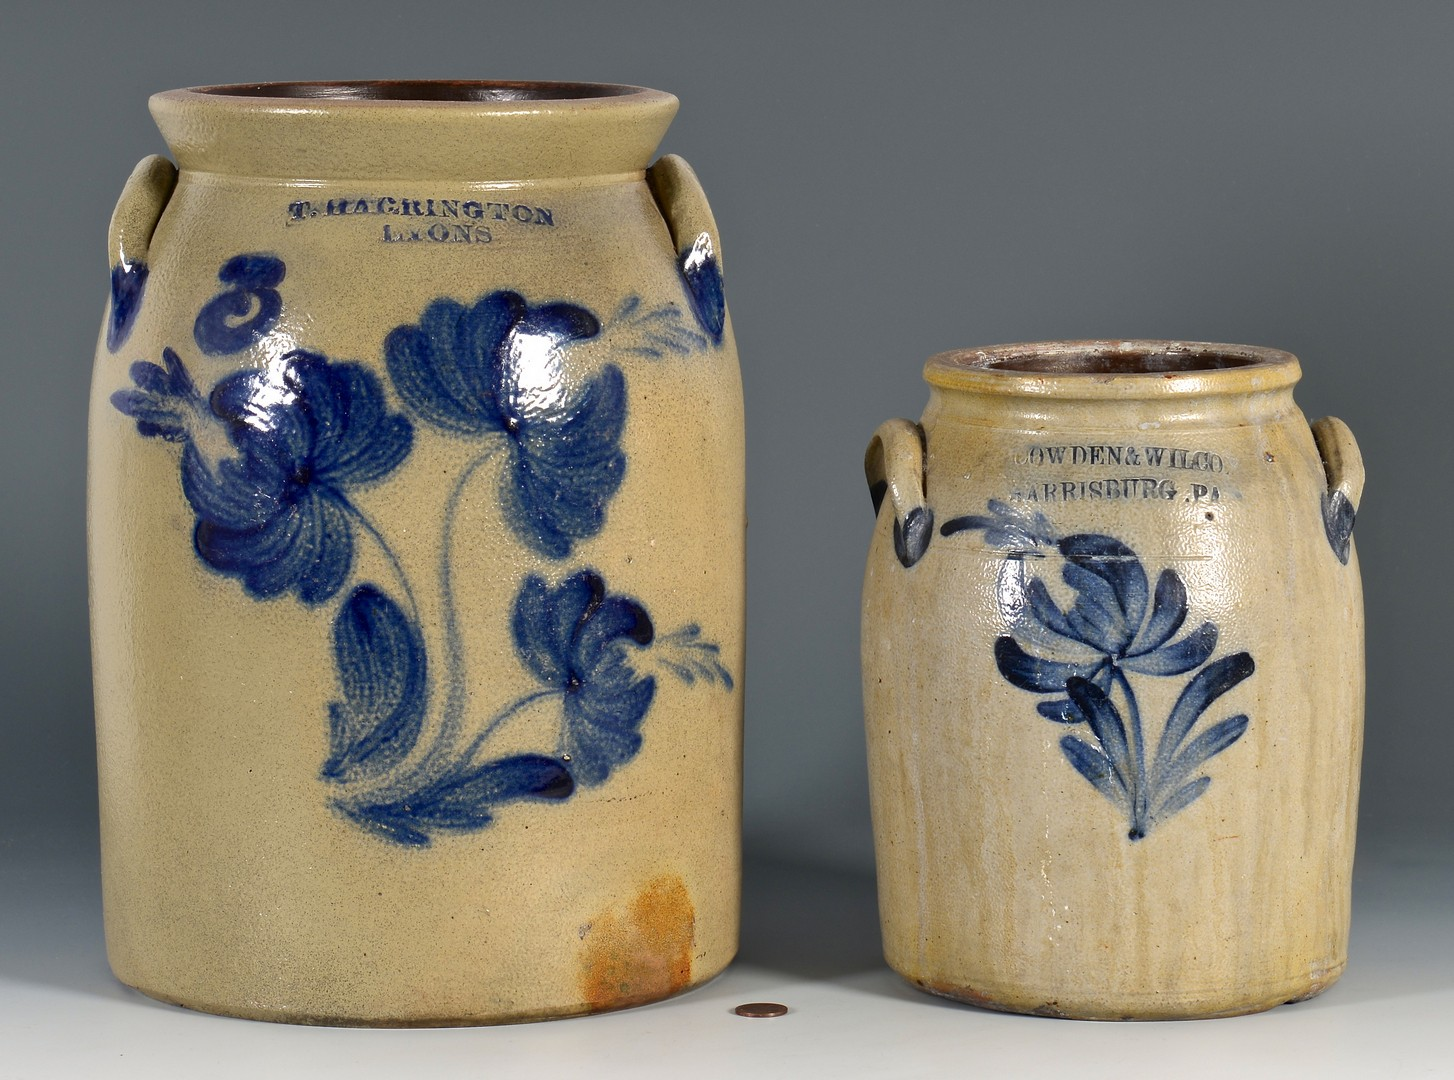 Lot 644: Cowden & Wilcox and Harrington Stoneware Jars